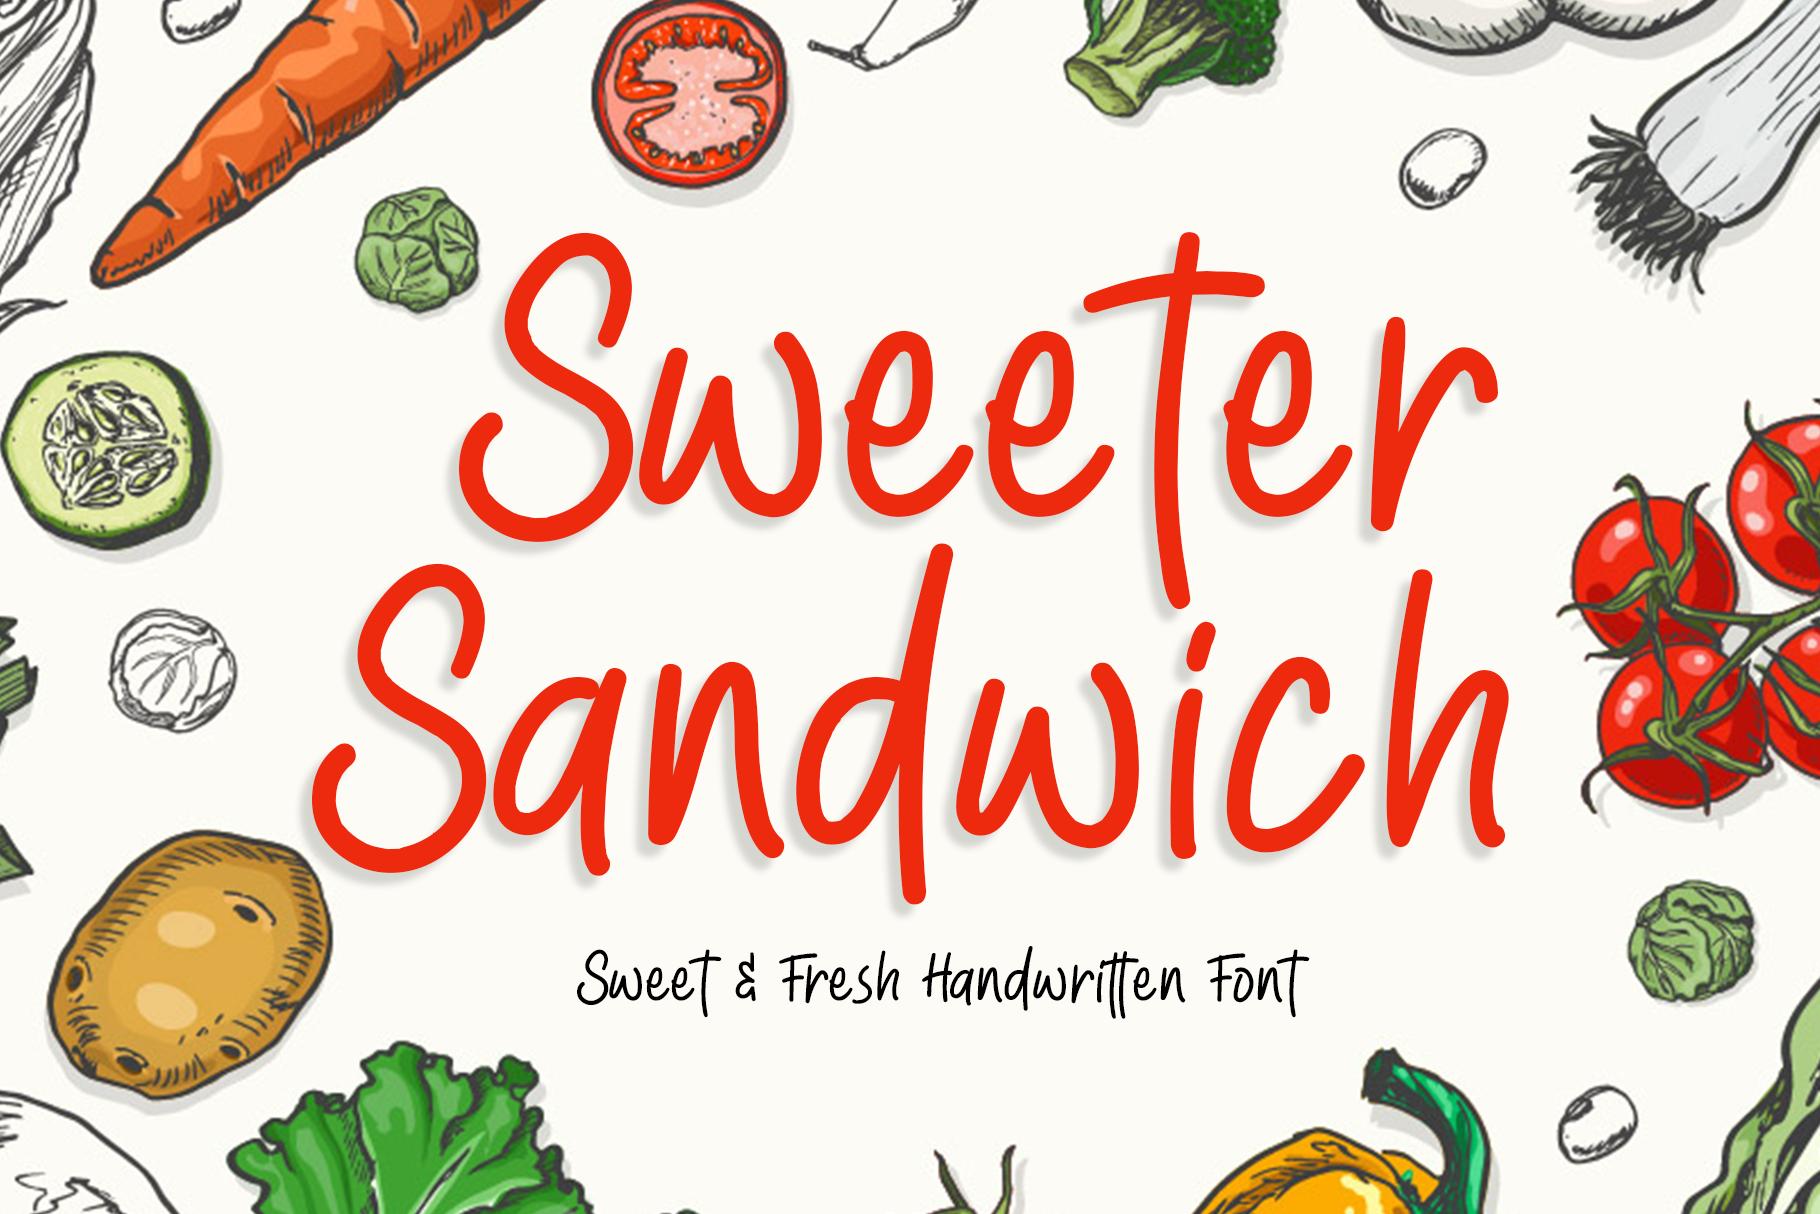 Sweeter Sandwich Handwritten Font example image 1